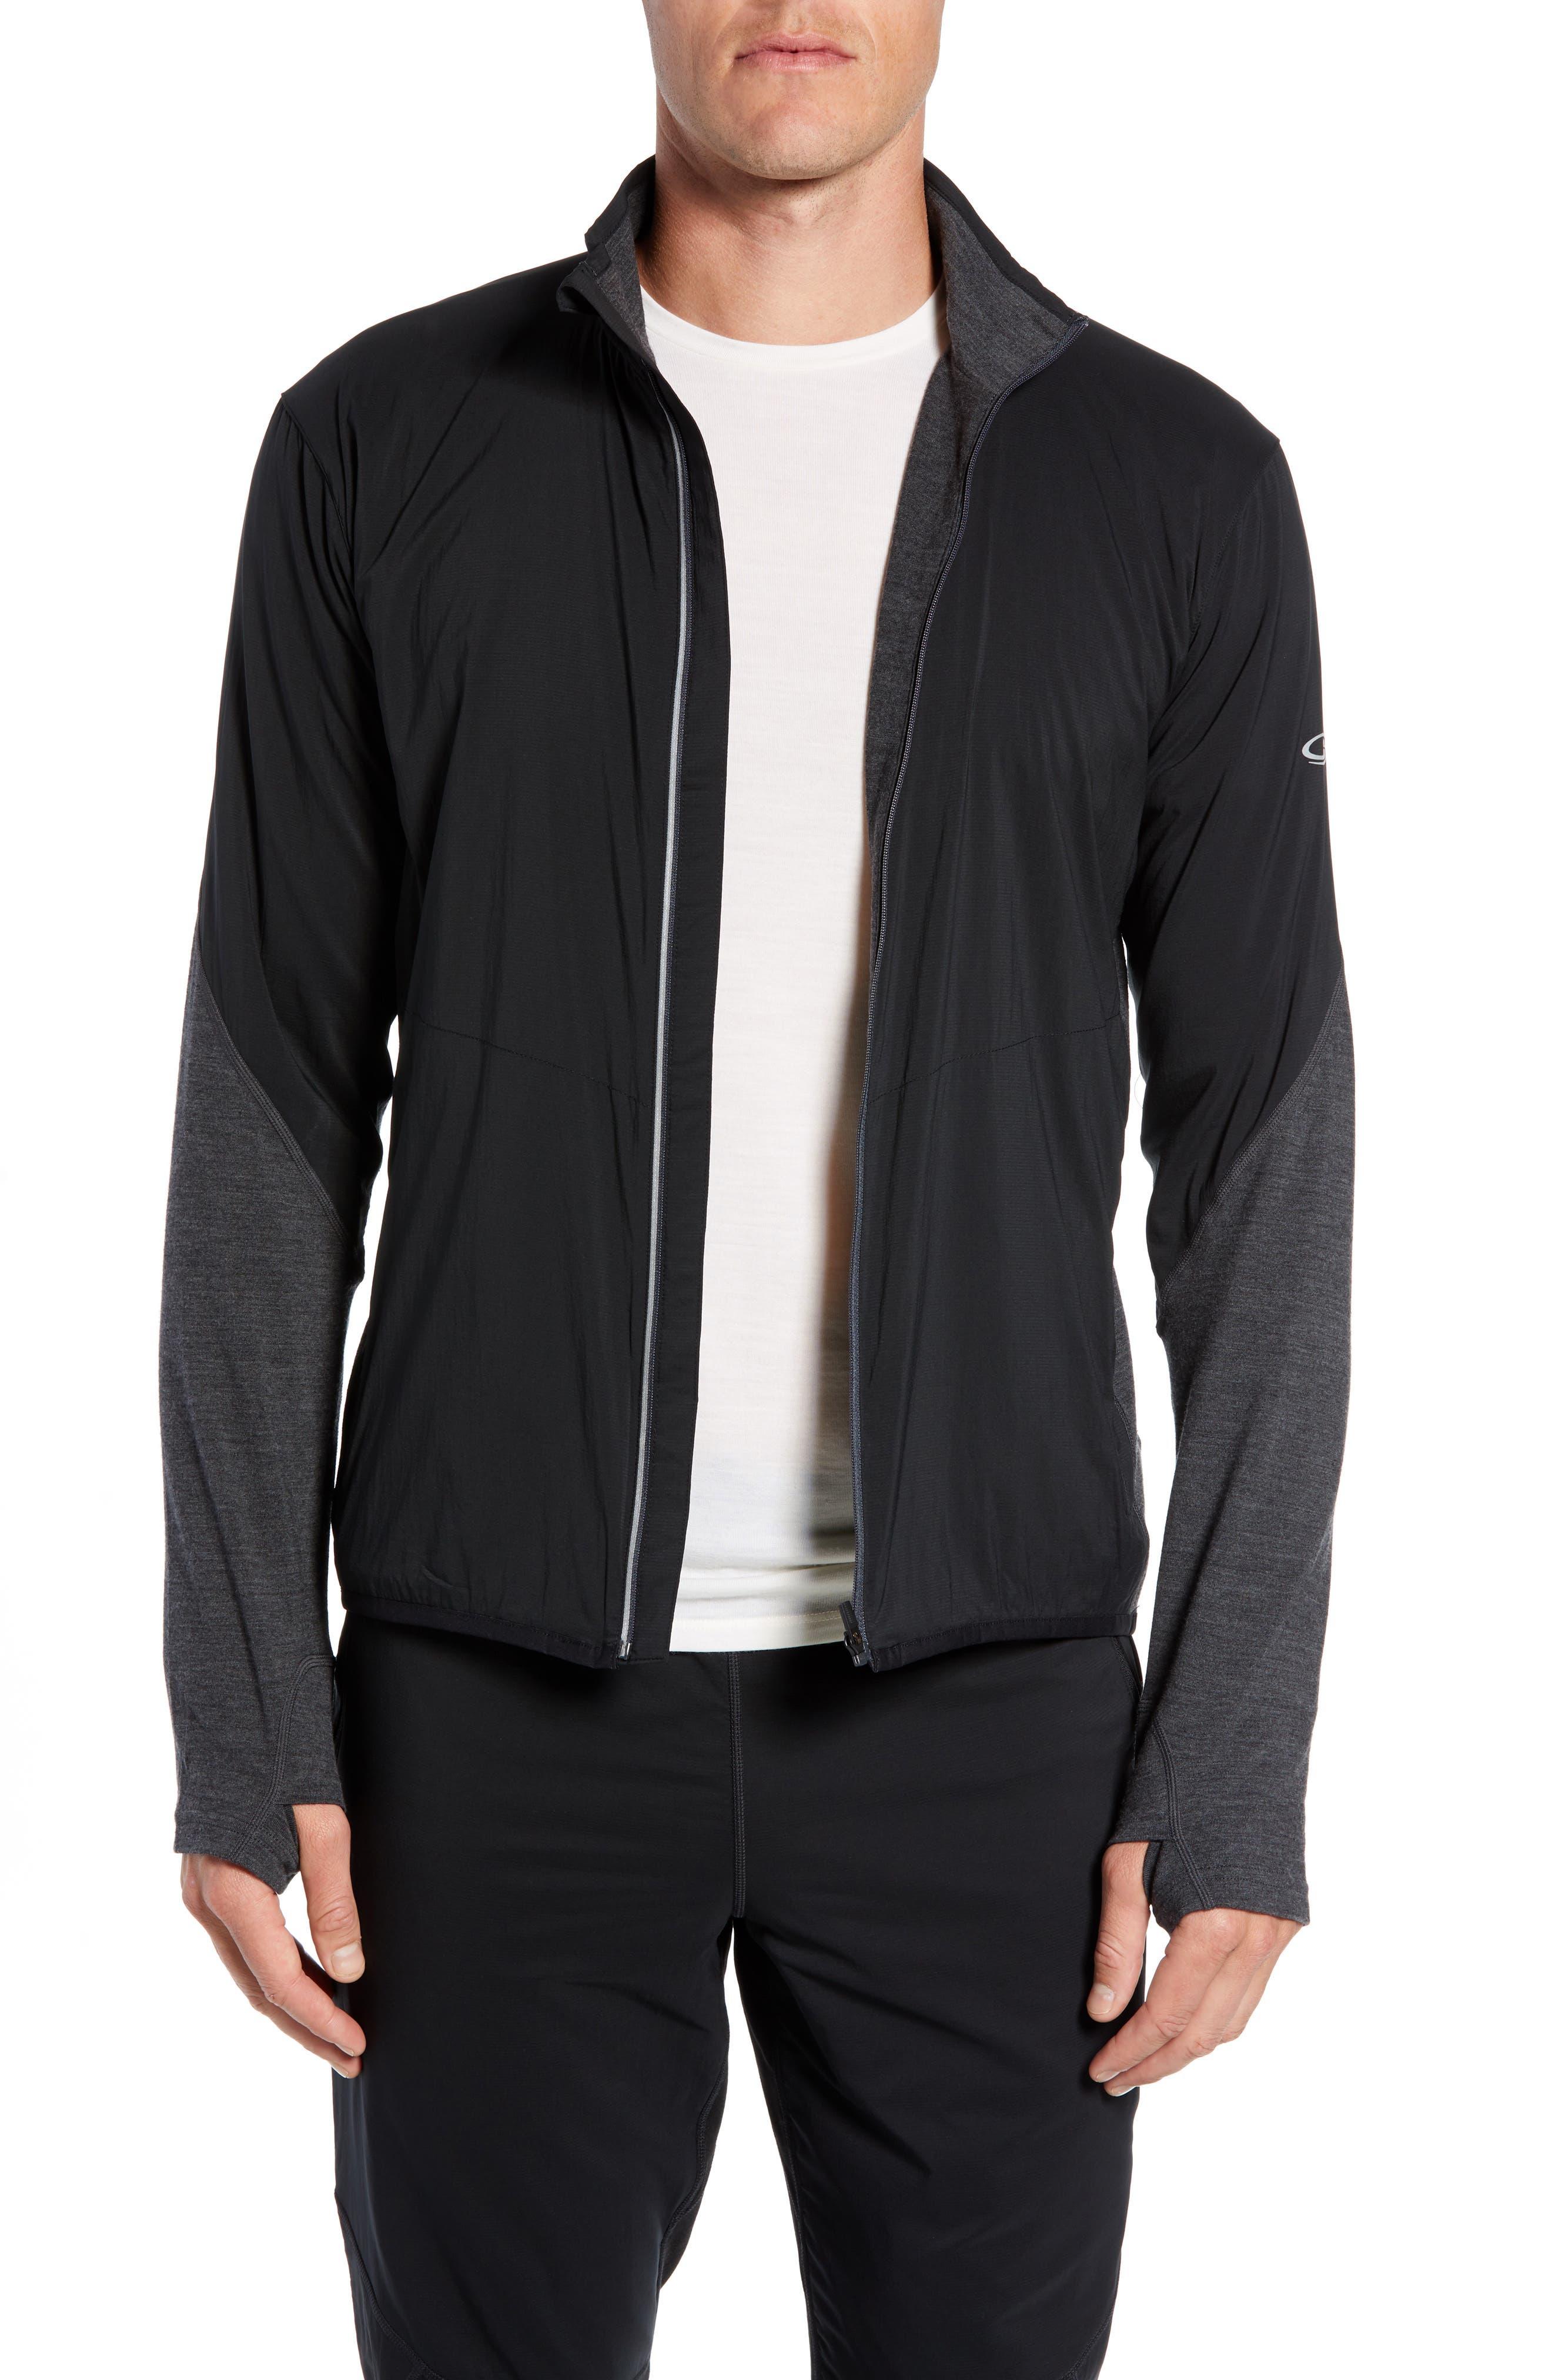 Icebreaker Tech Trainer Hybrid Jacket, Black